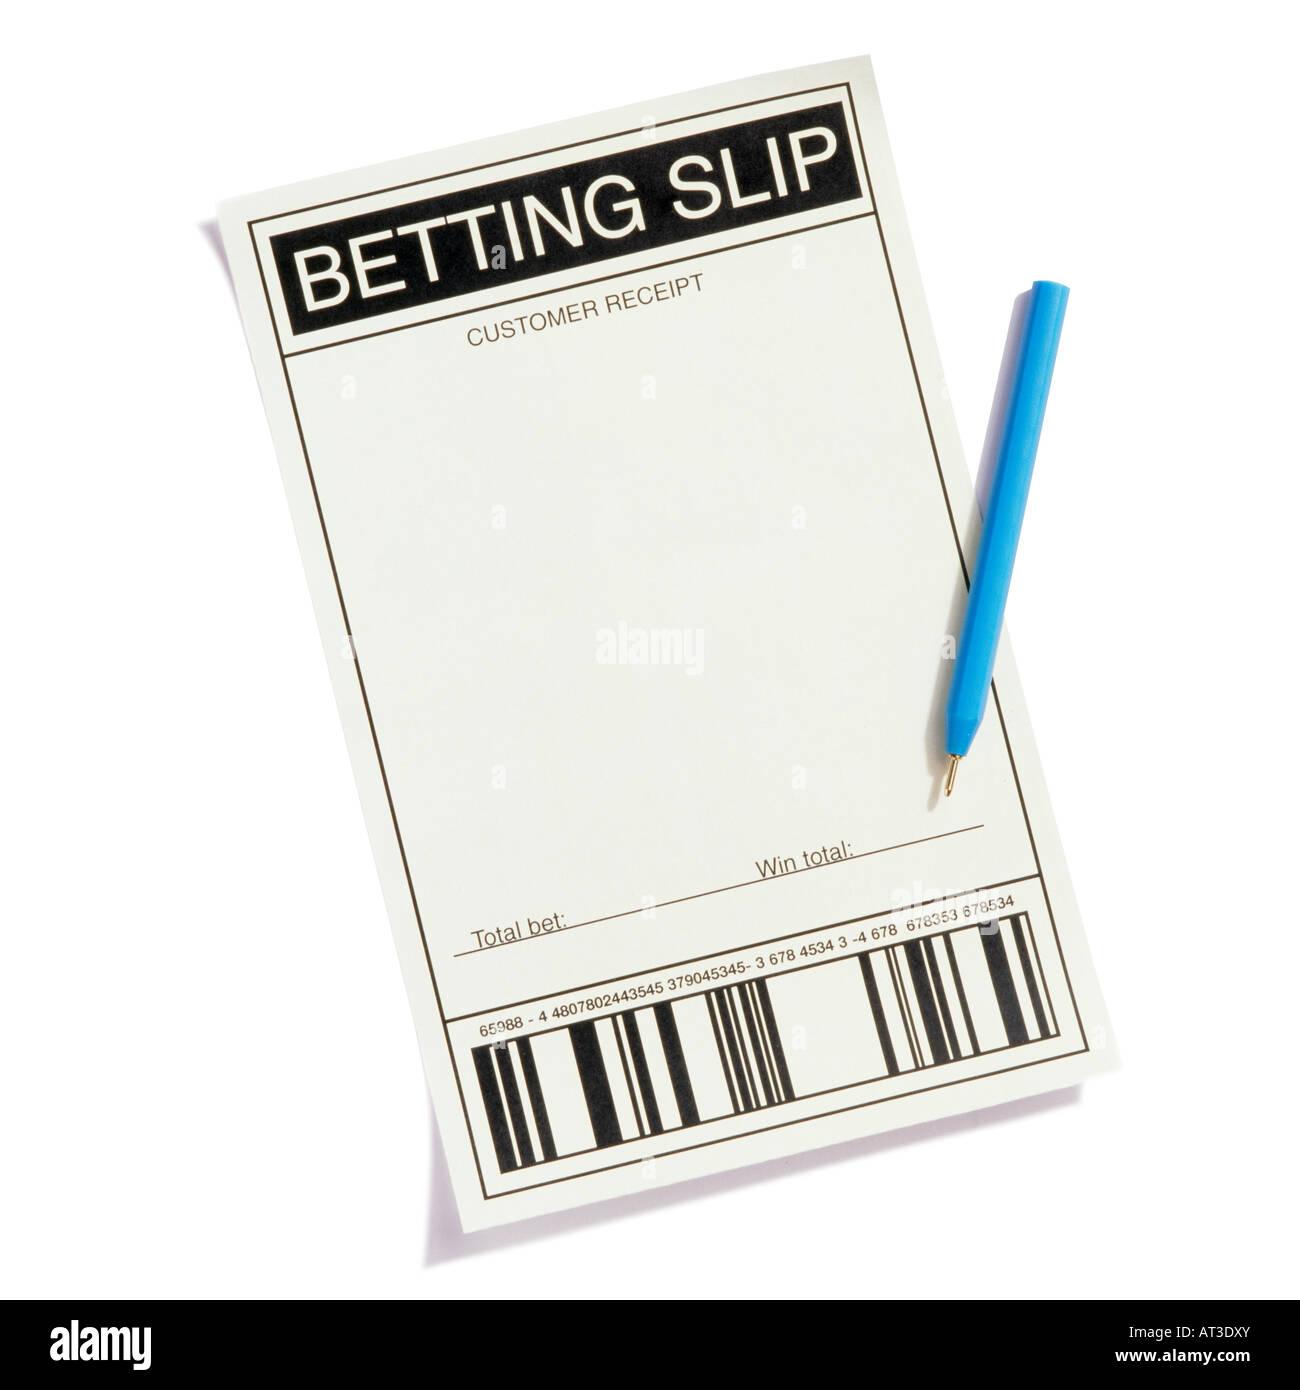 Betting slip template keev csgo betting